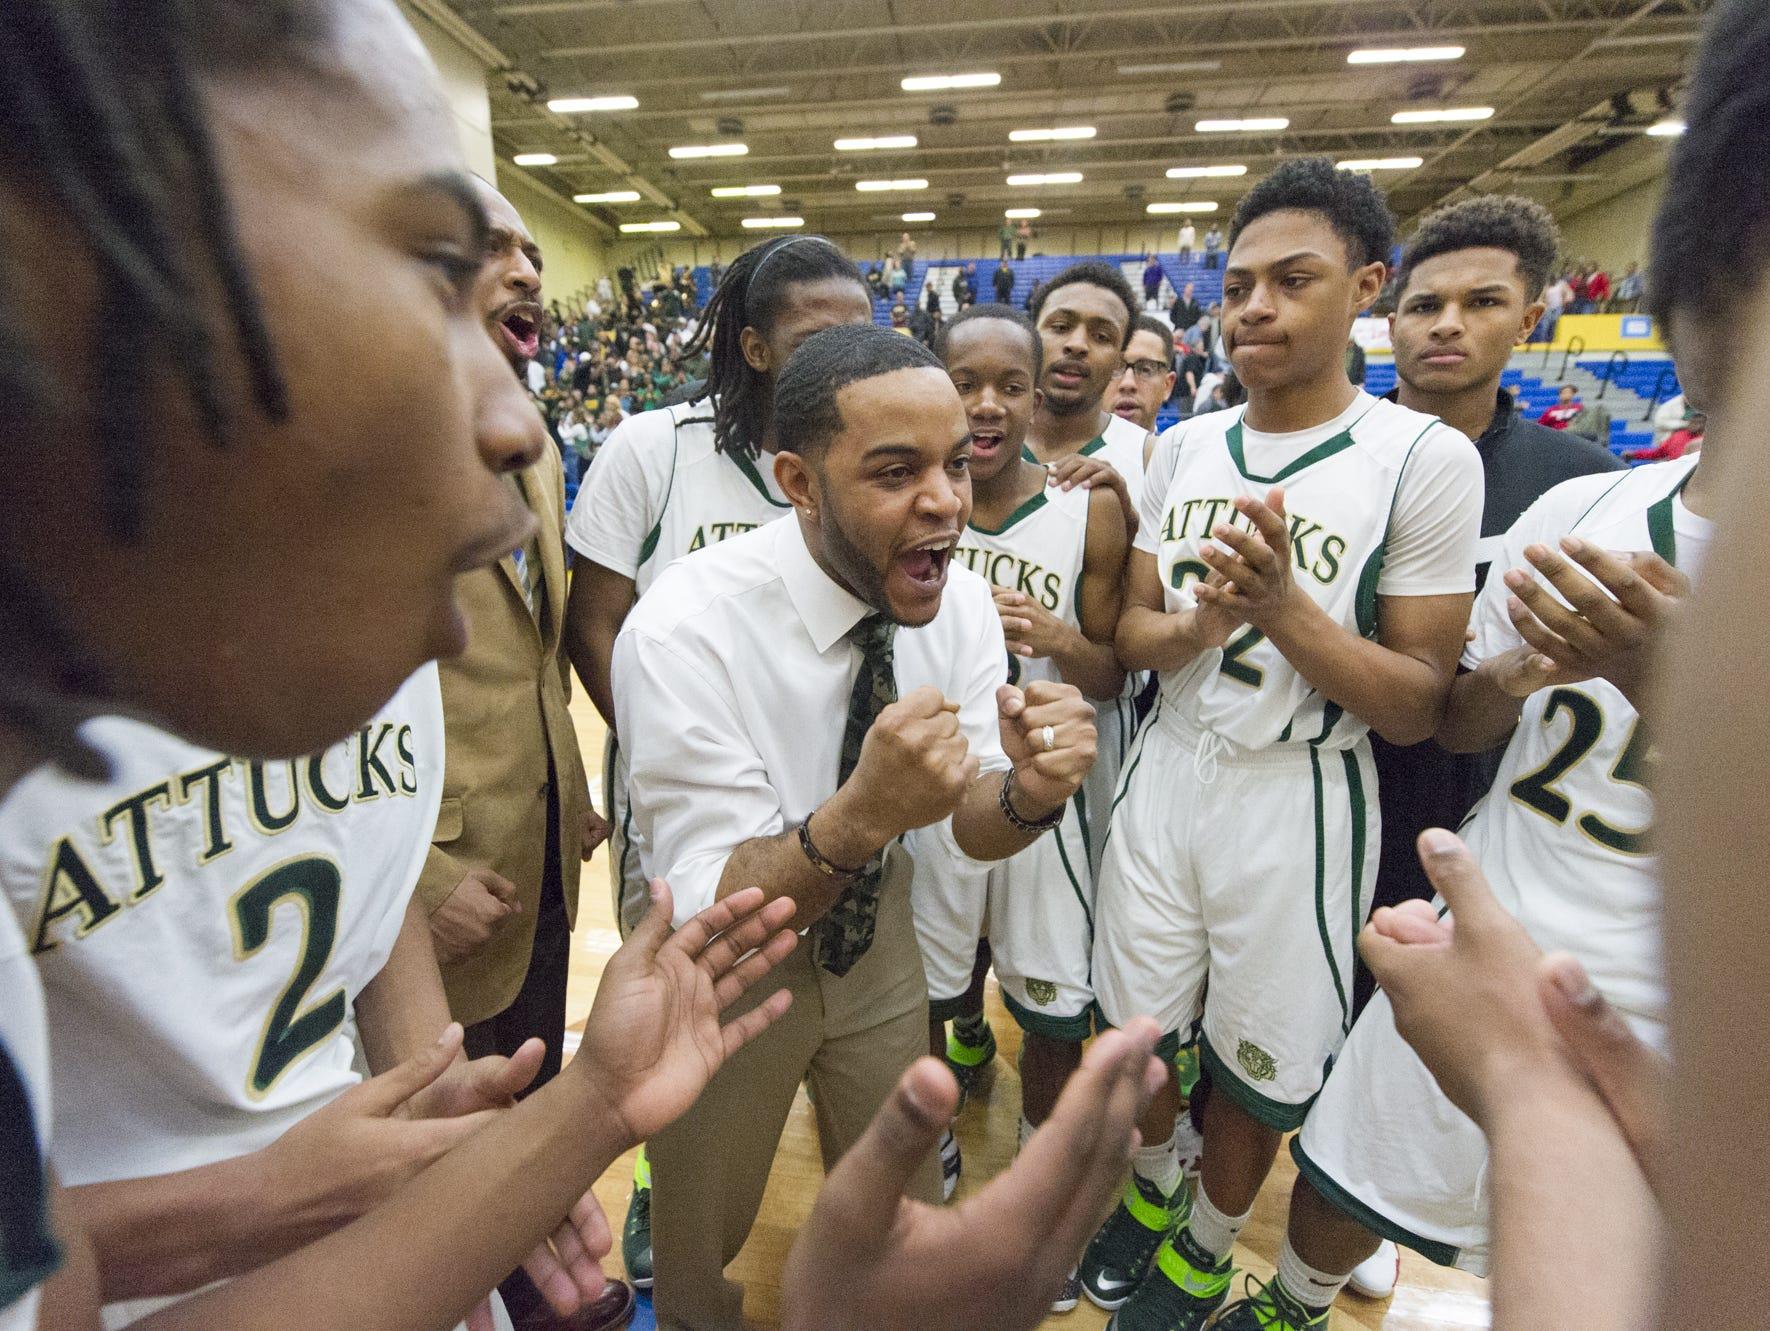 FILE – Former Attucks coach Phillip Washington (center) celebrates the a Class 2A regional win on March 14, 2015.